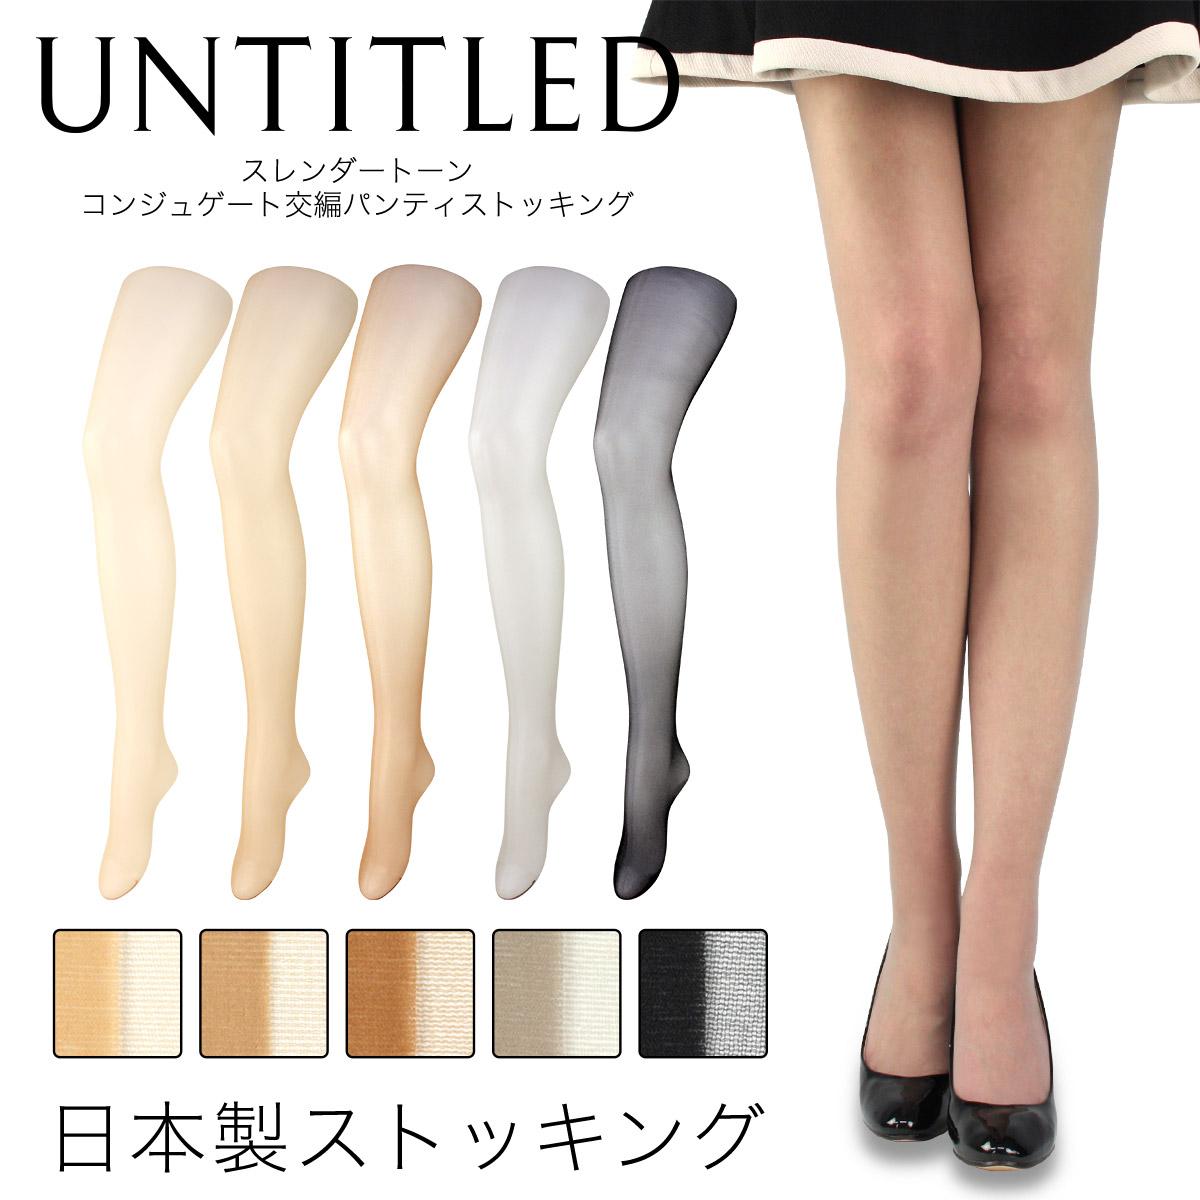 UNTITLED - 女士连裤袜 / 丝袜 [ 纤细 ] / 163-1535 / 日本制 / 所有产品均享10倍积分 !!